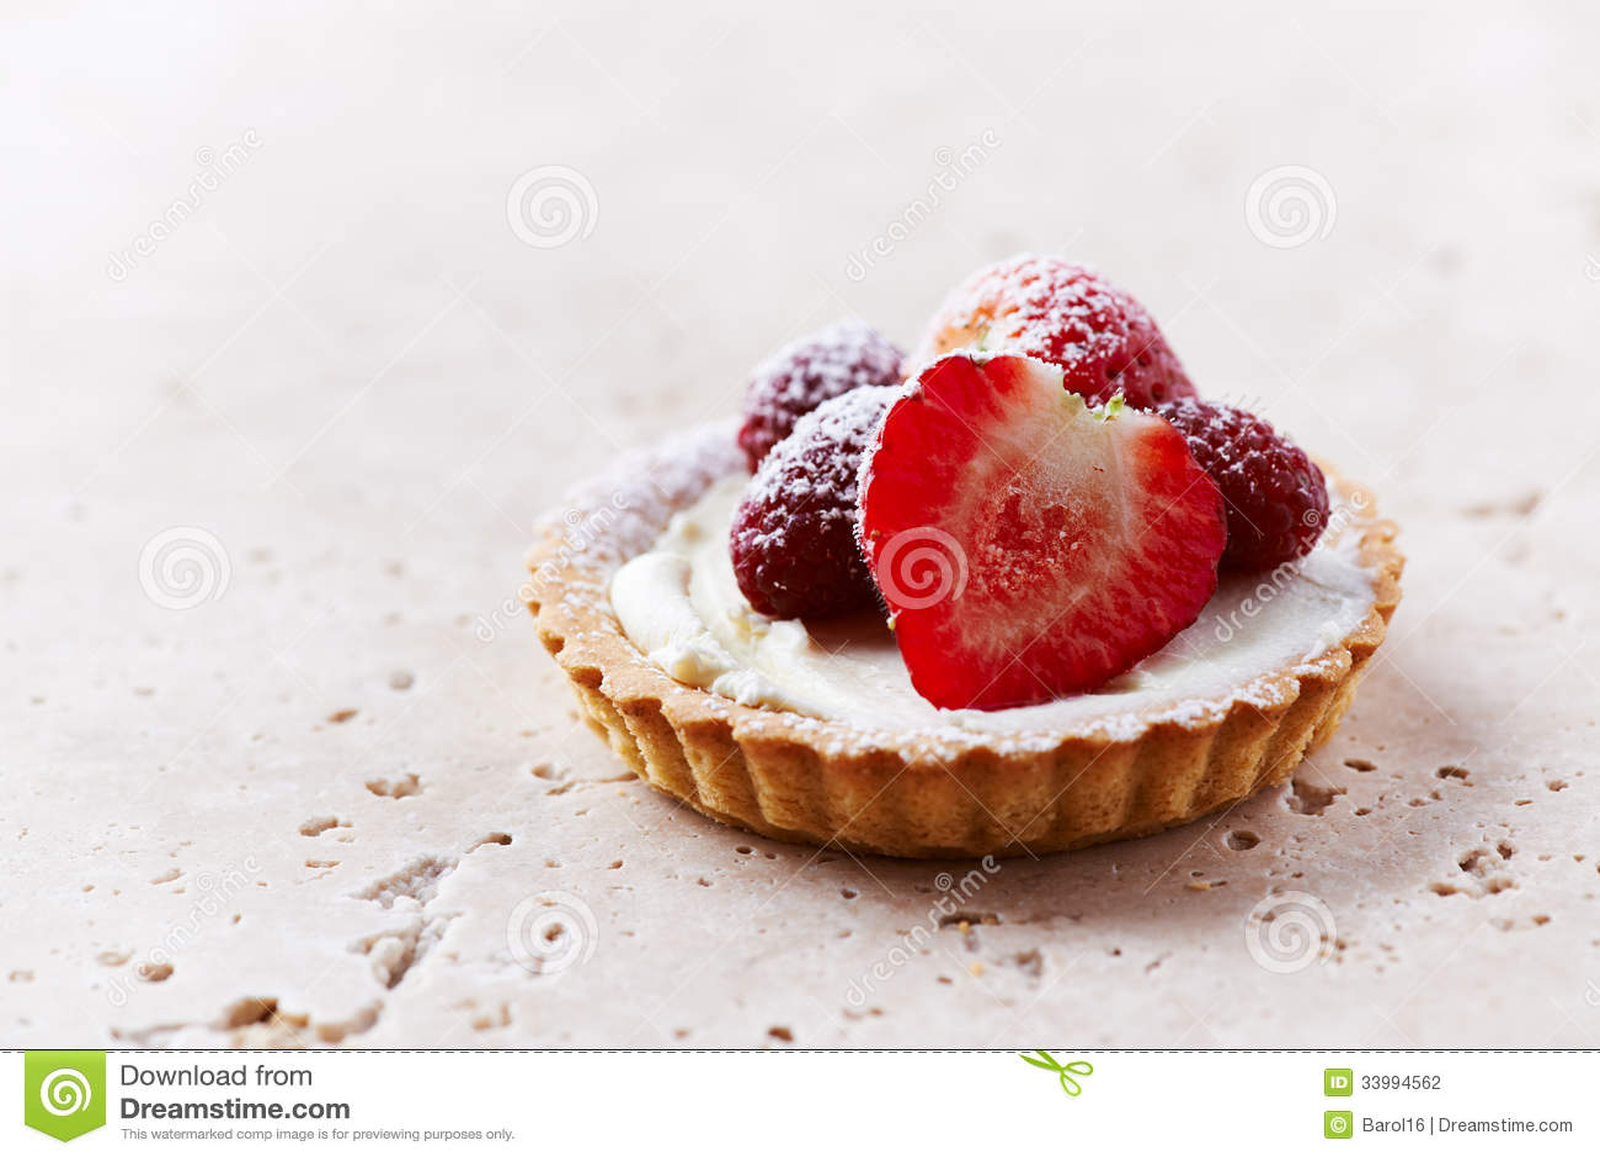 Little mascarpone tart with fresh summer berries